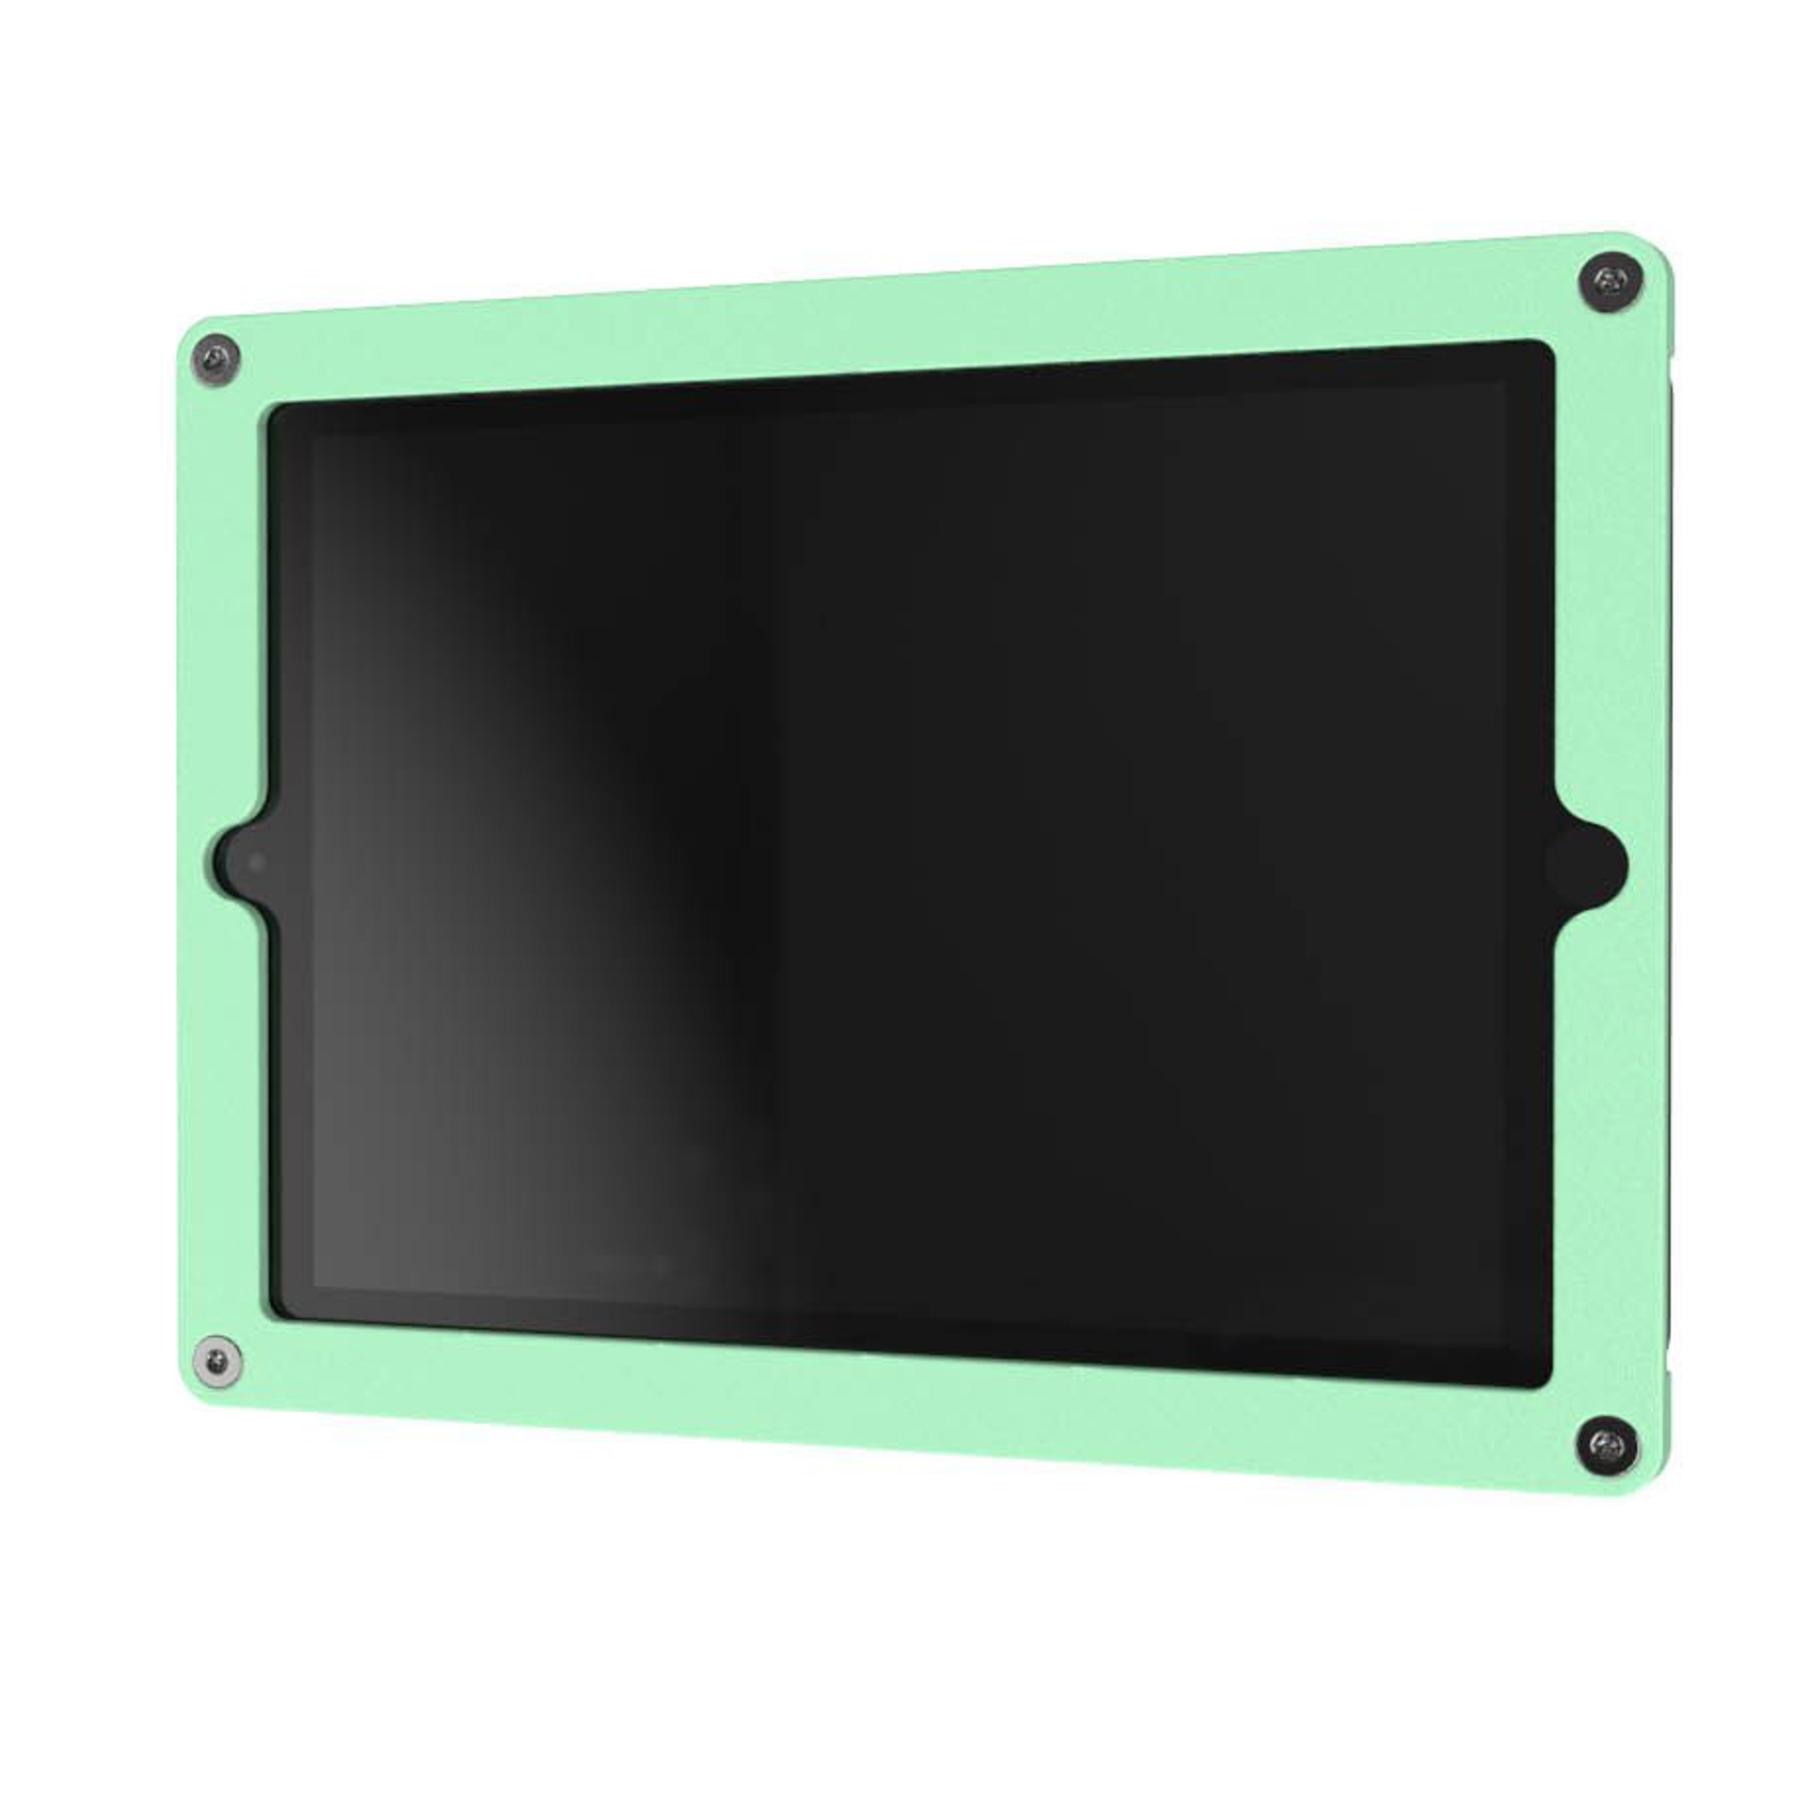 Heckler Design Windfall Frame For Ipad Mini Cash Drawers